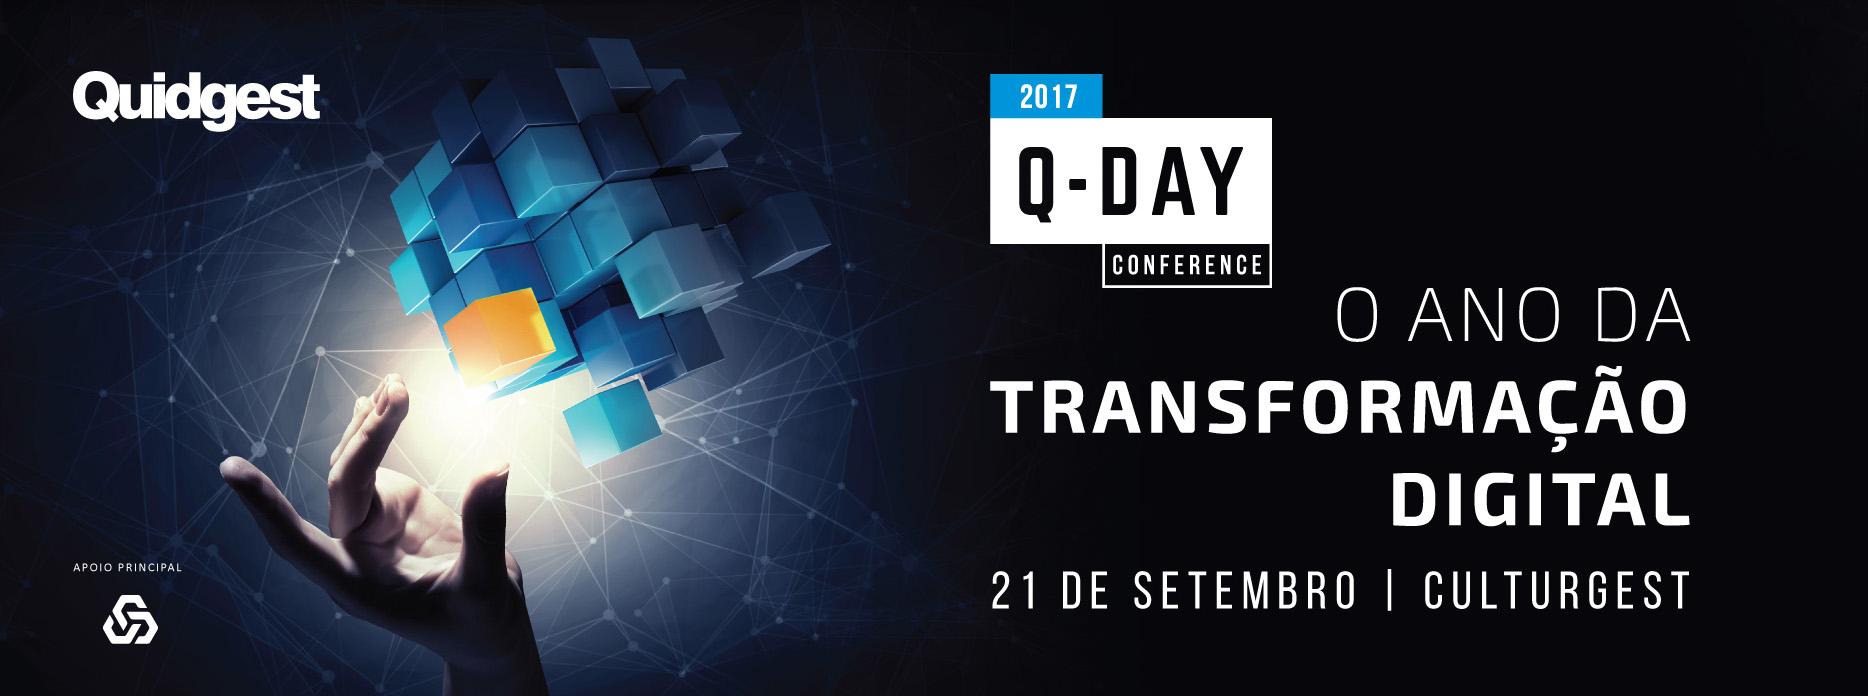 q-day 2017